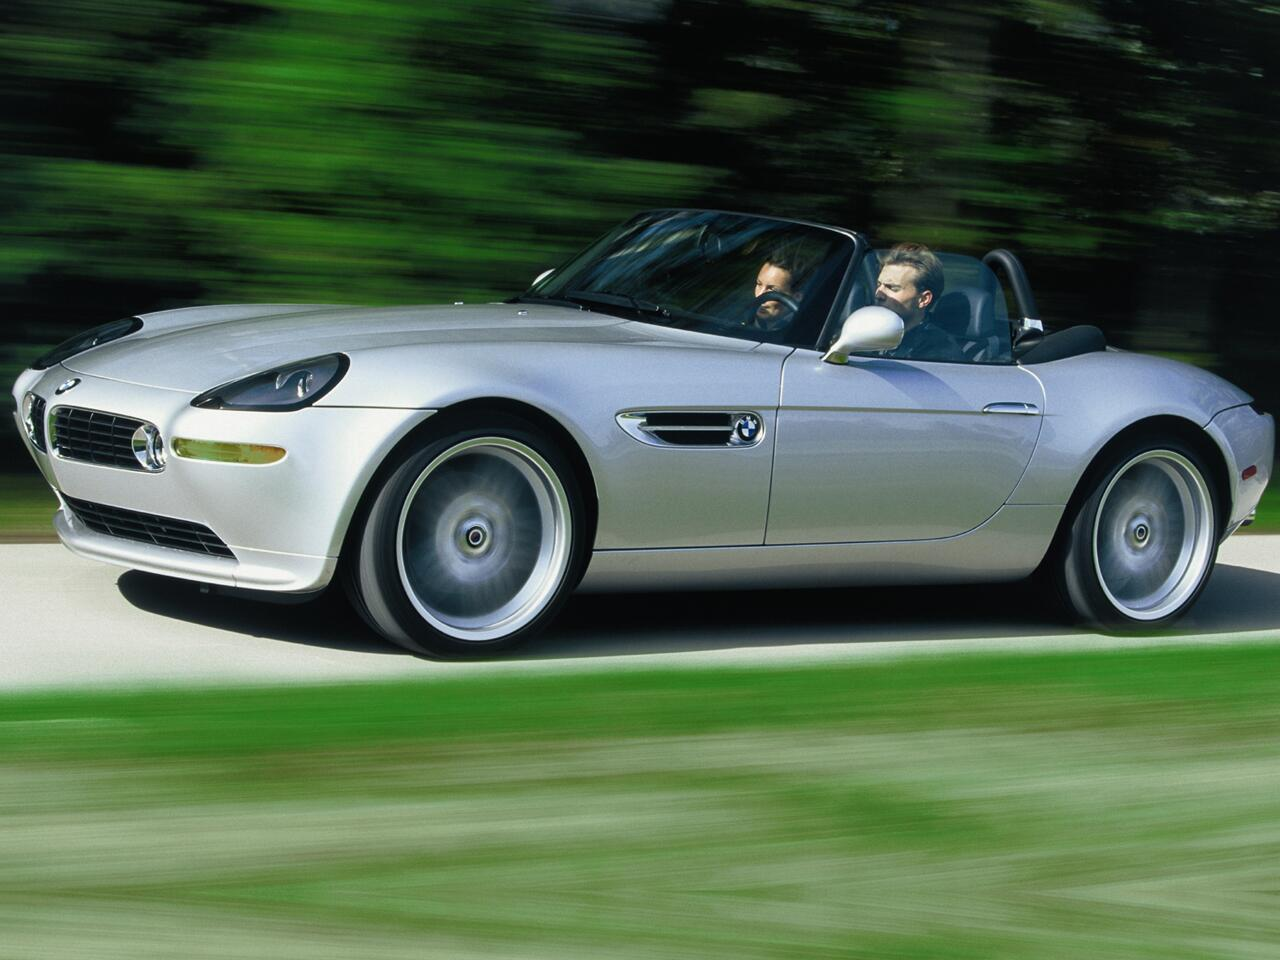 Bild zu BMW Alpina Roadster V8 Limited Edition